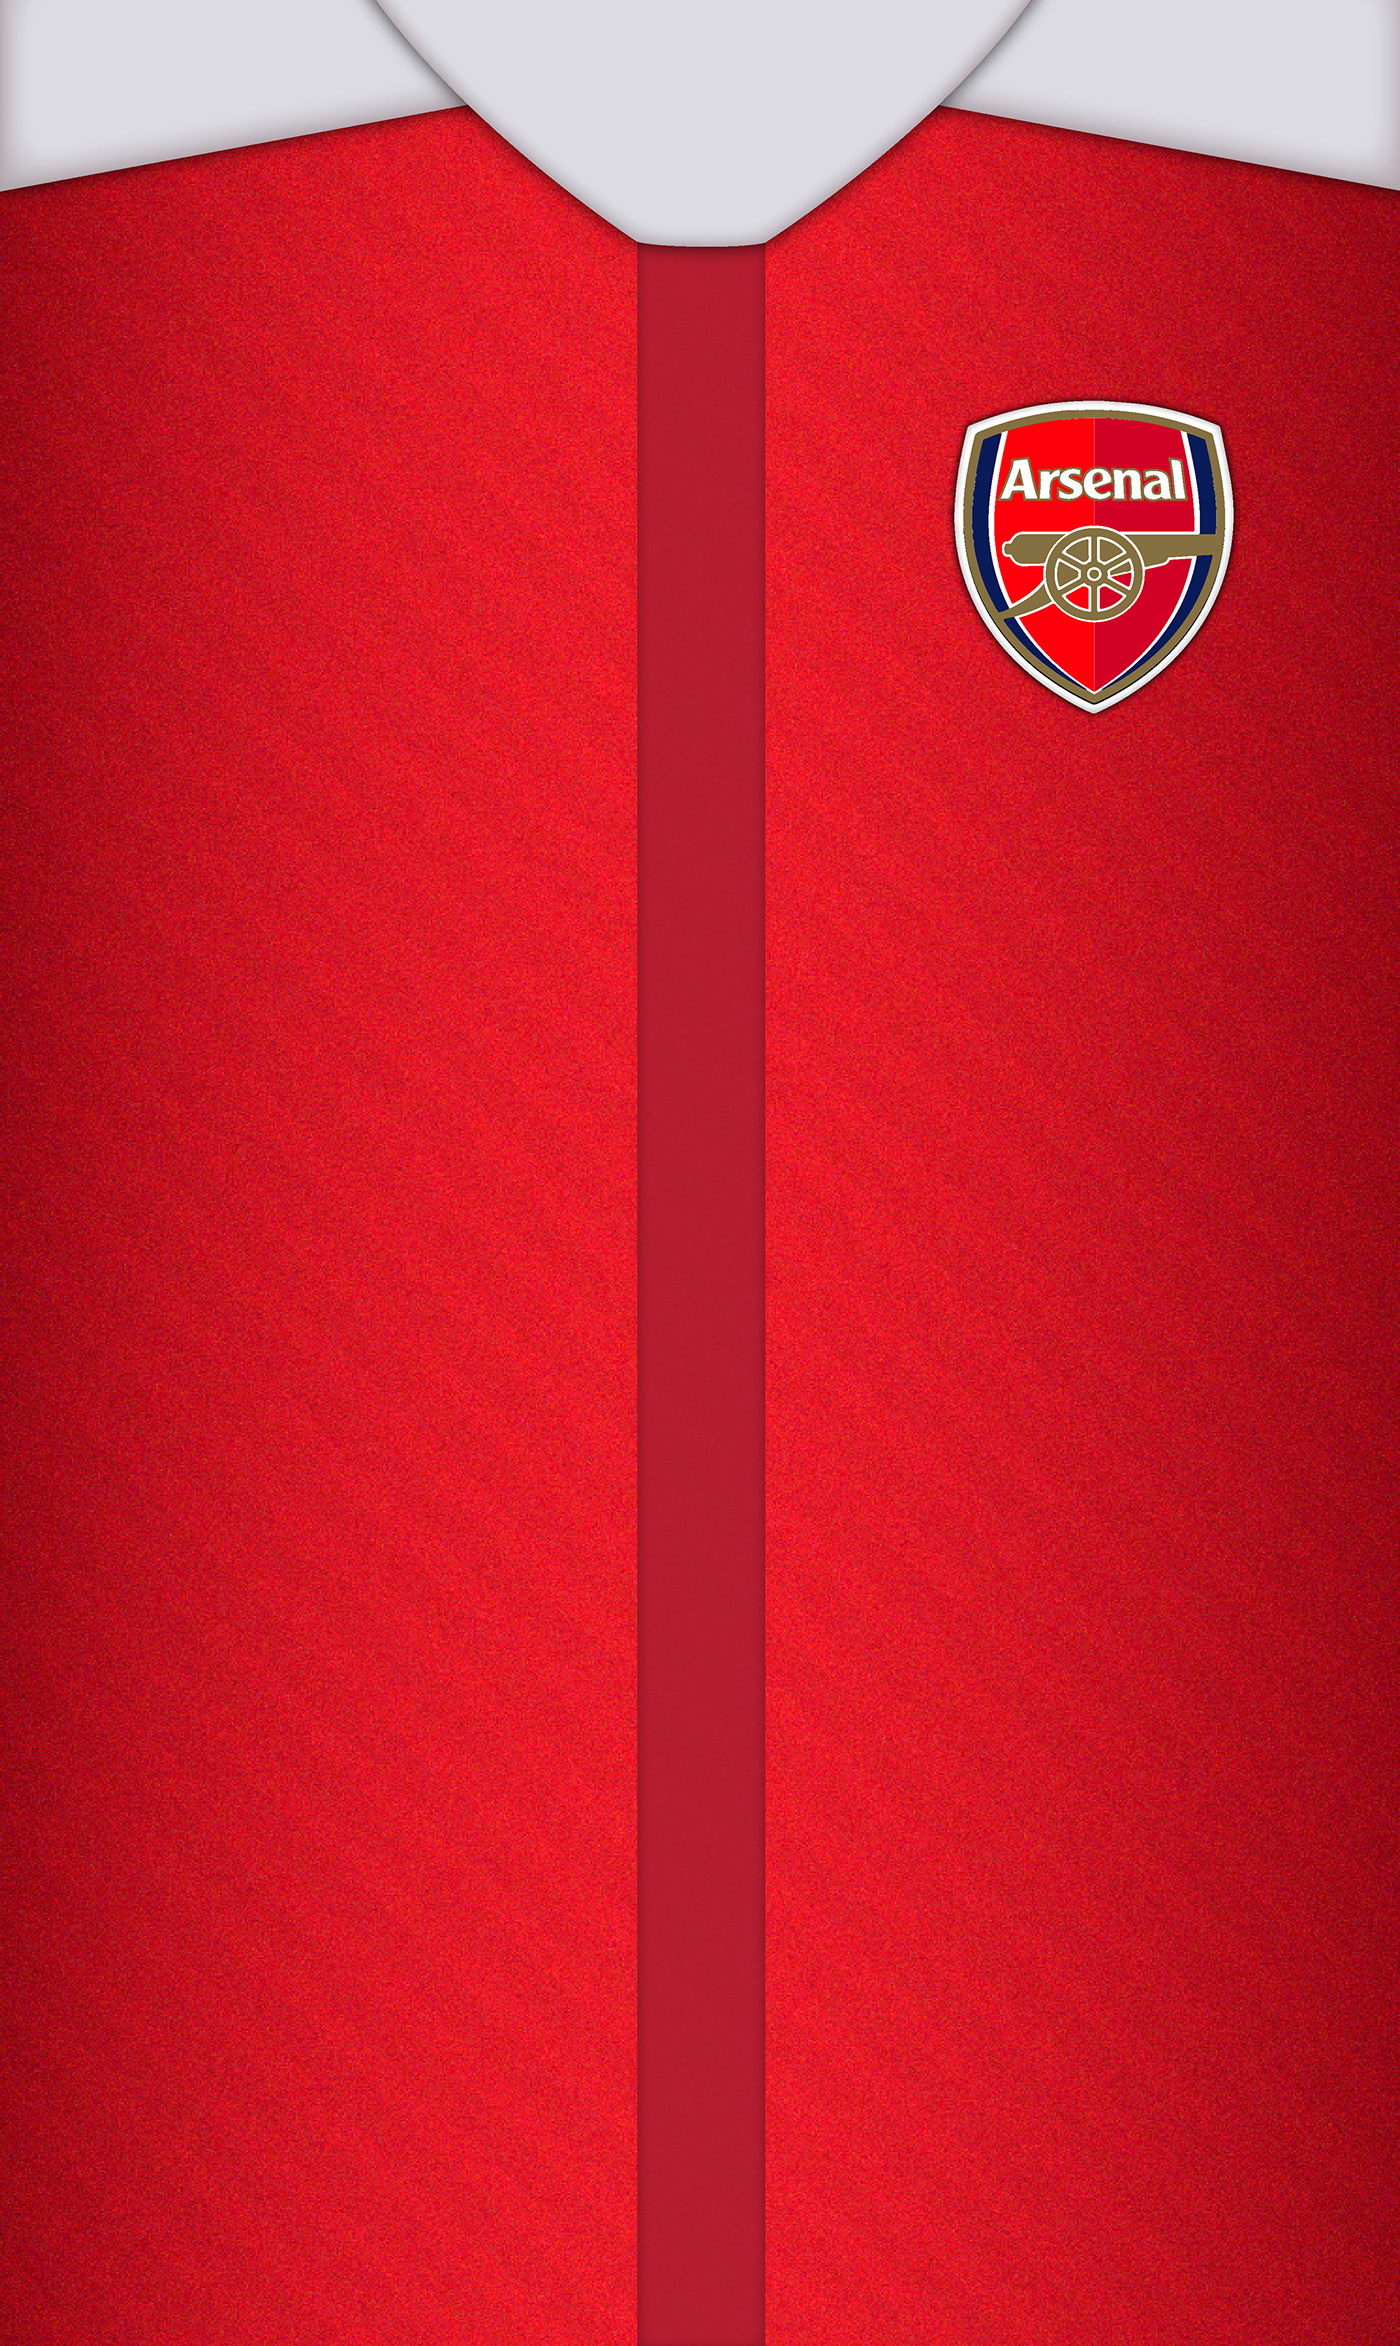 2016 17 Premier League Wallpapers On Behance